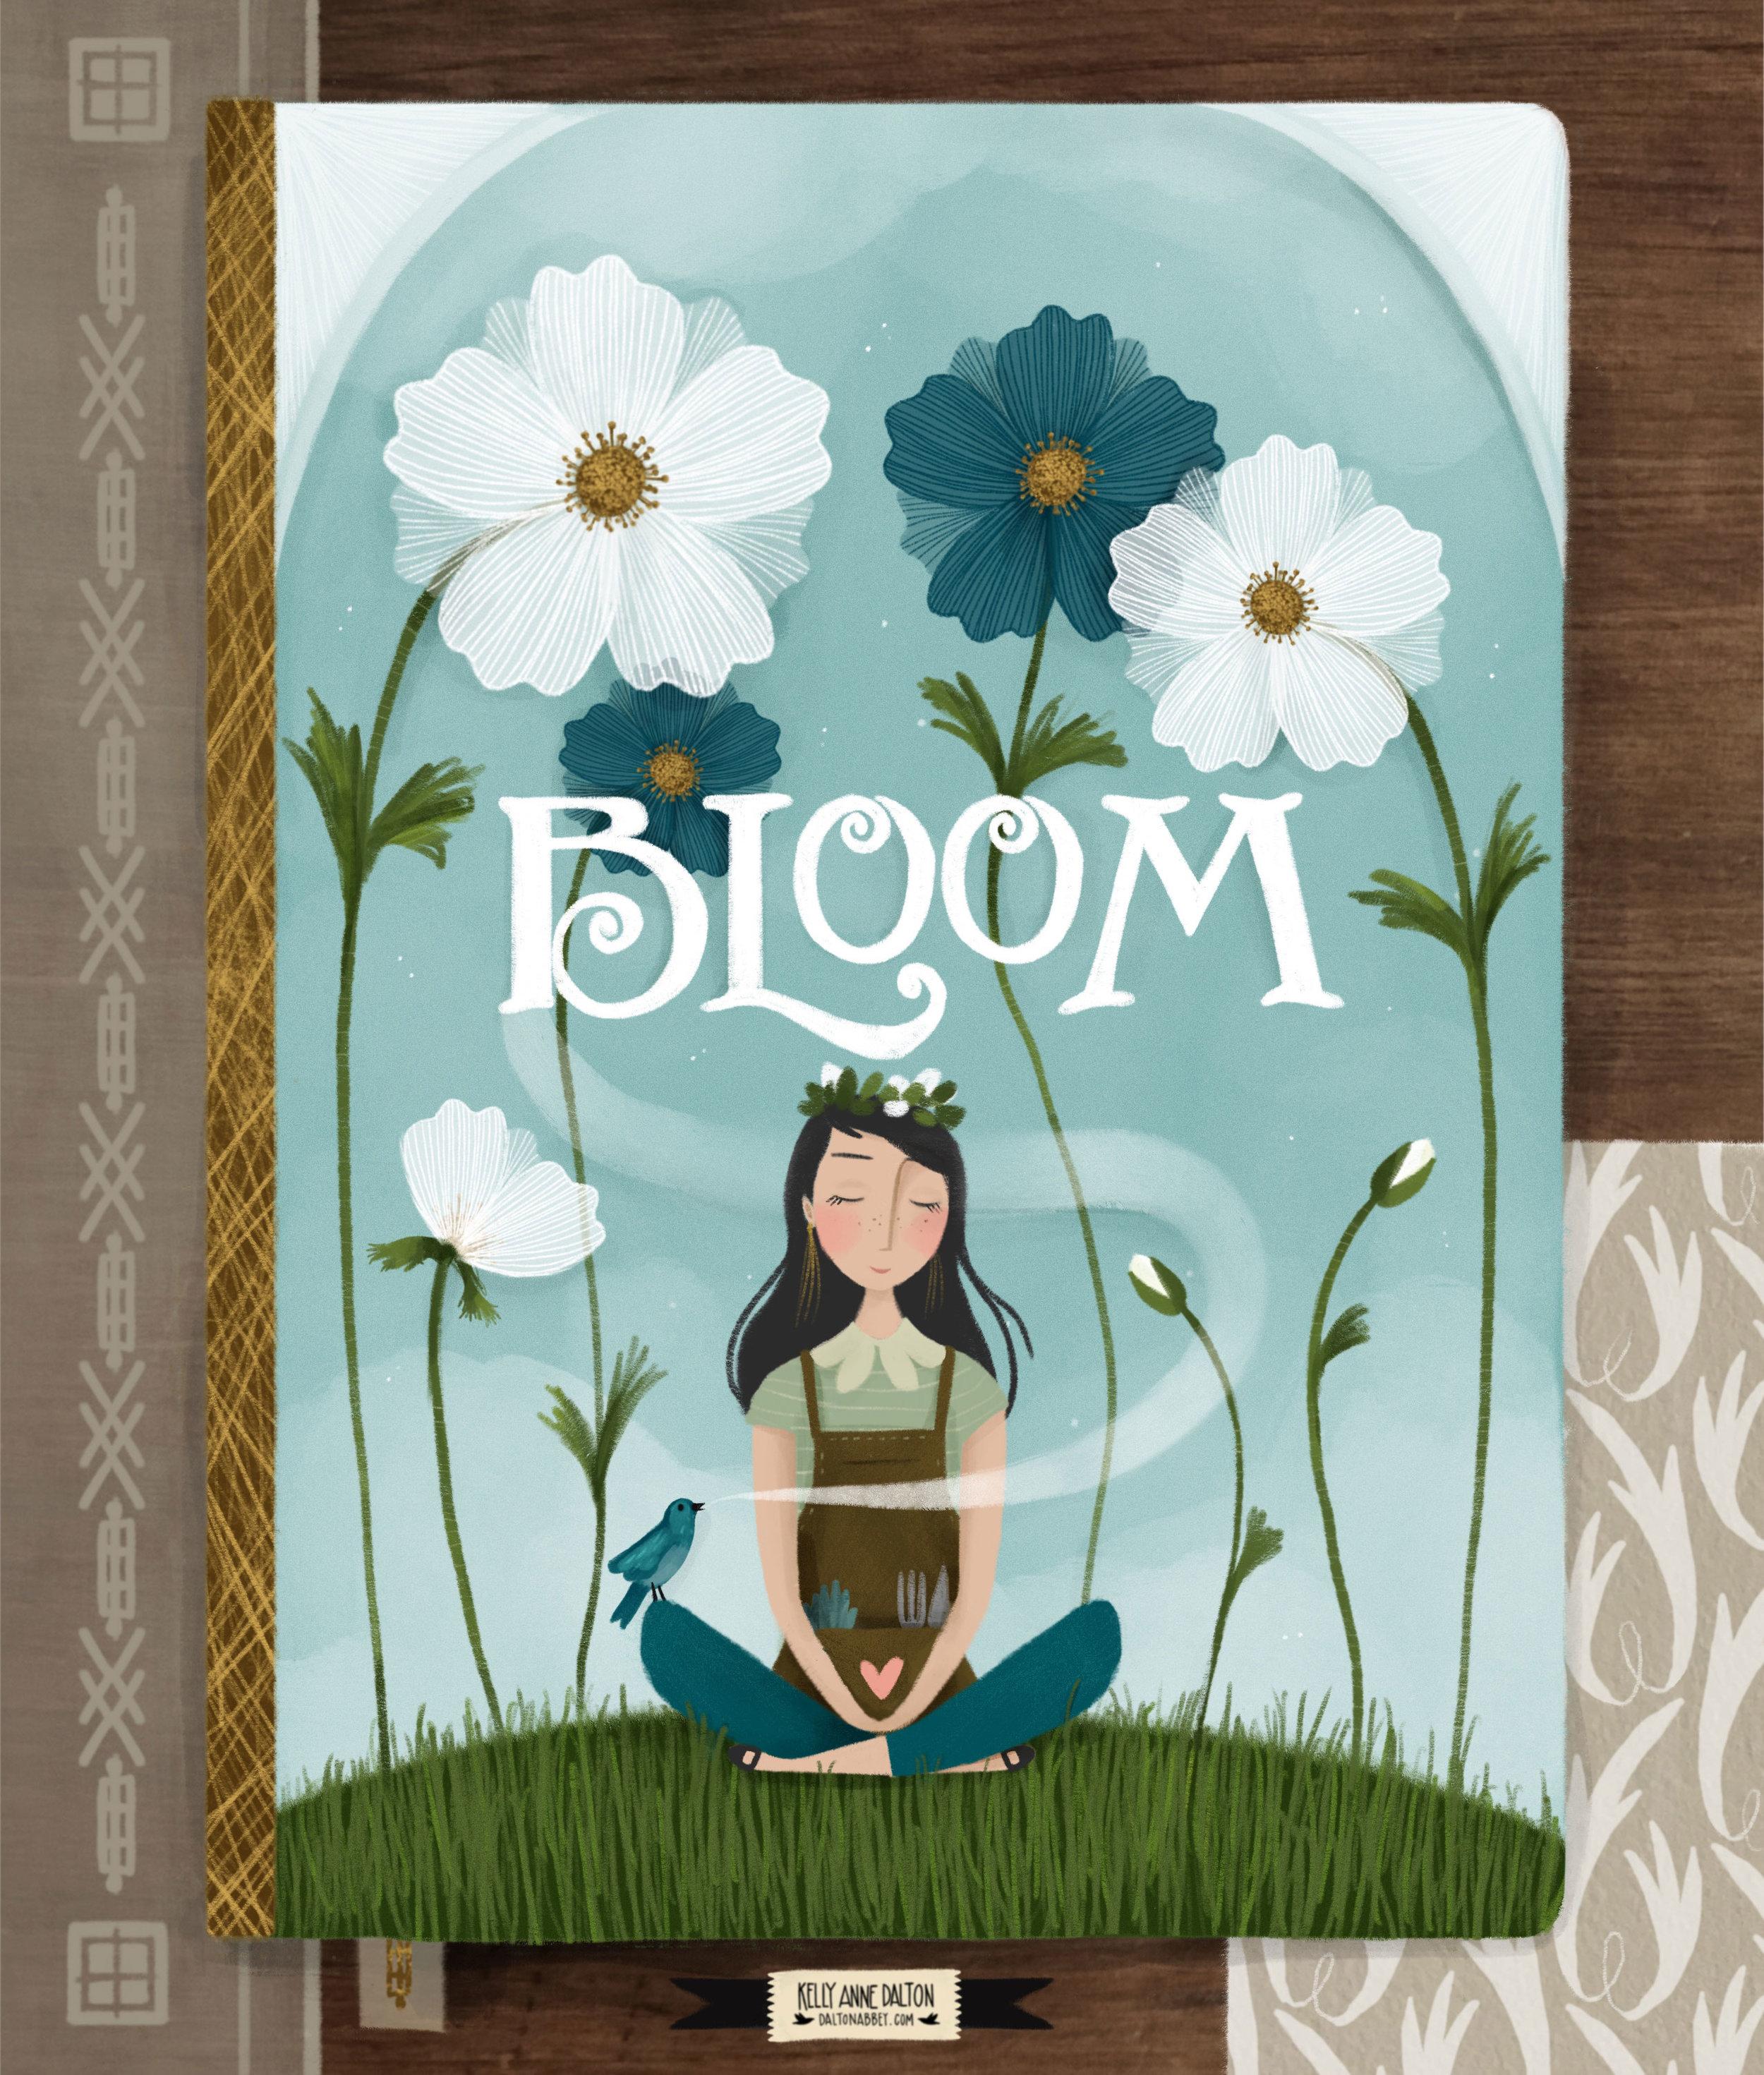 Bloomjournalcover_kellyannedalton.jpg